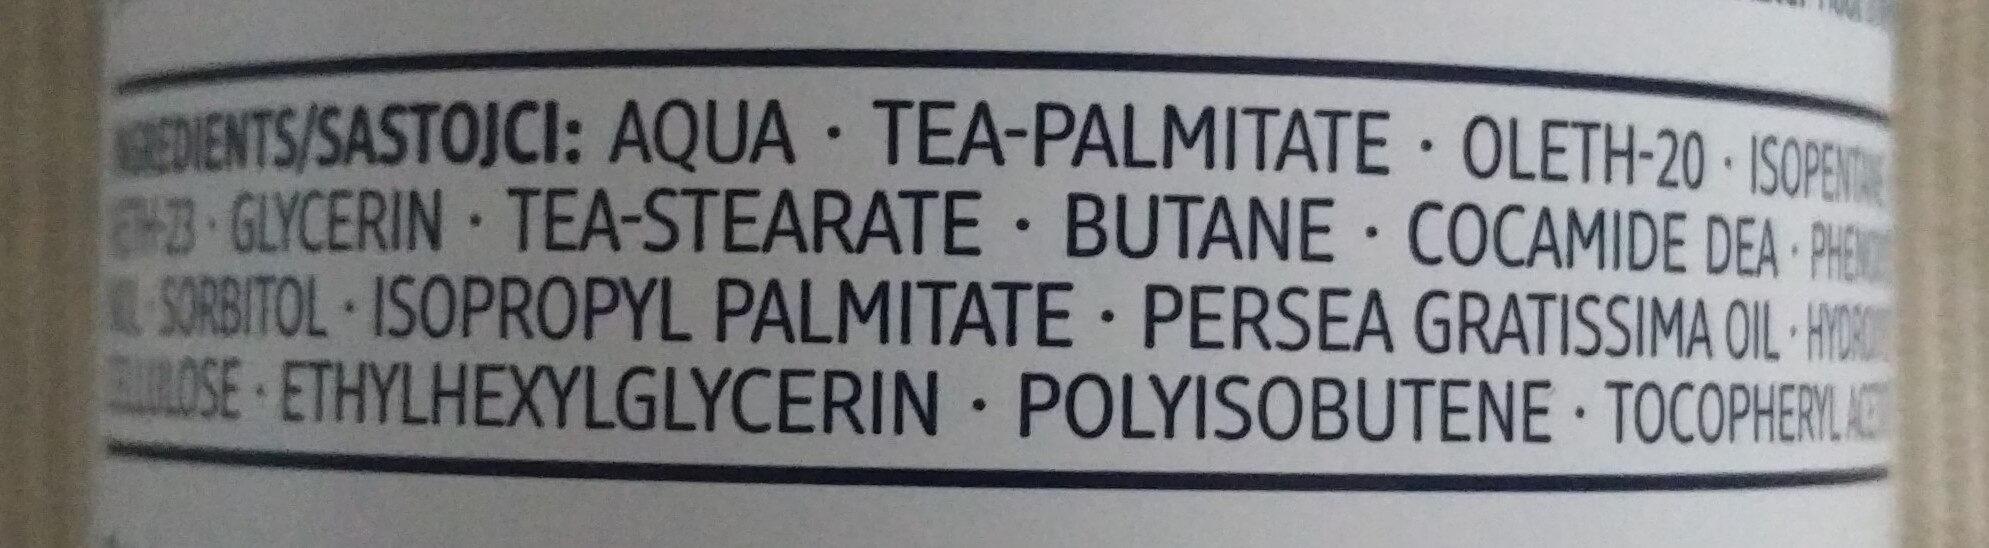 Ultra Sensitive Rasiergel - Ingredients - de